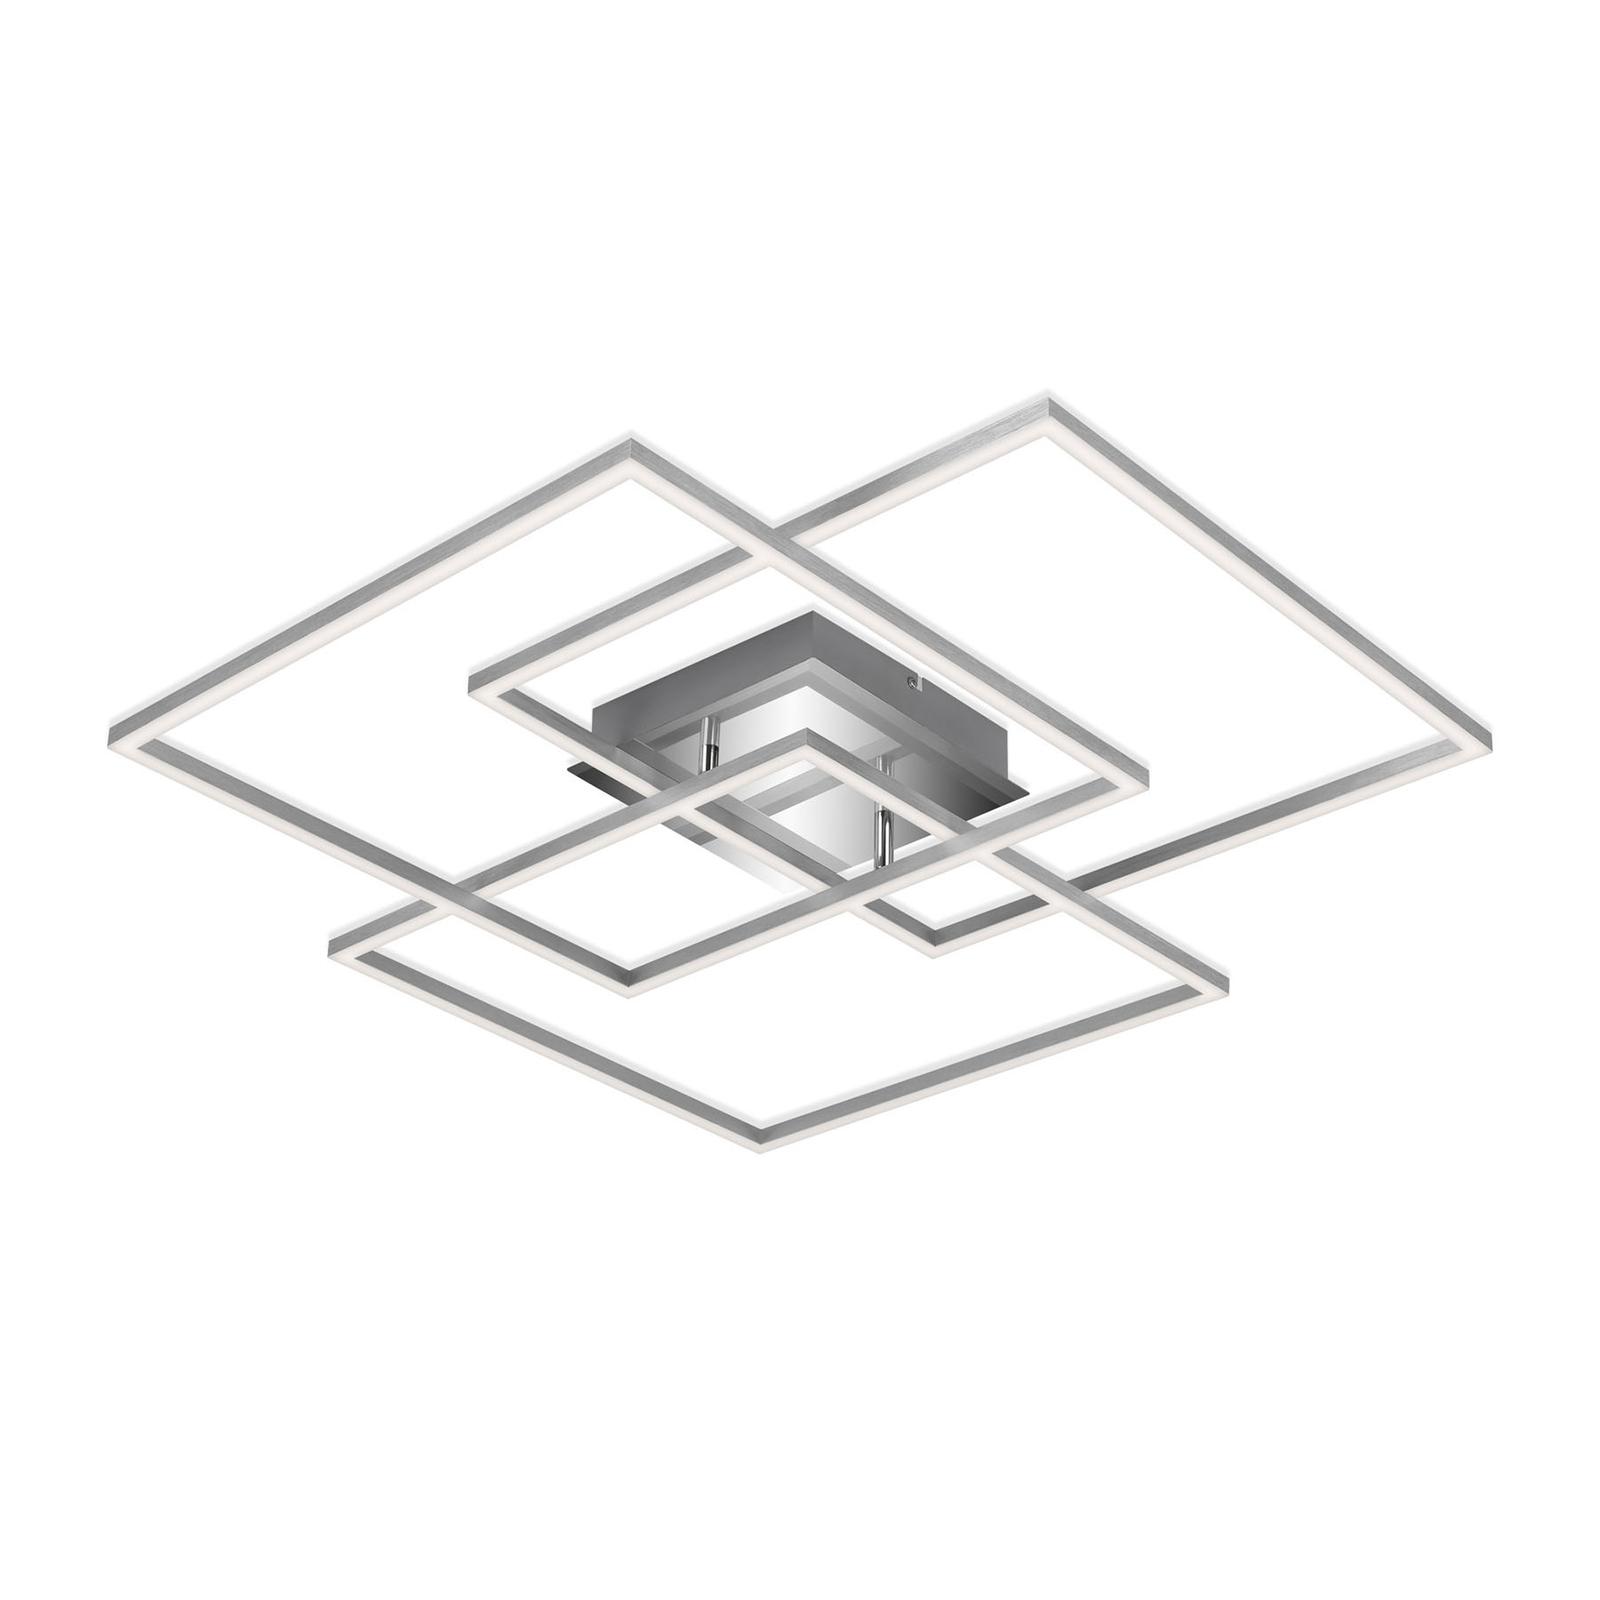 LED-taklampe Frame CCT, kromaluminium, 70 x 70 cm